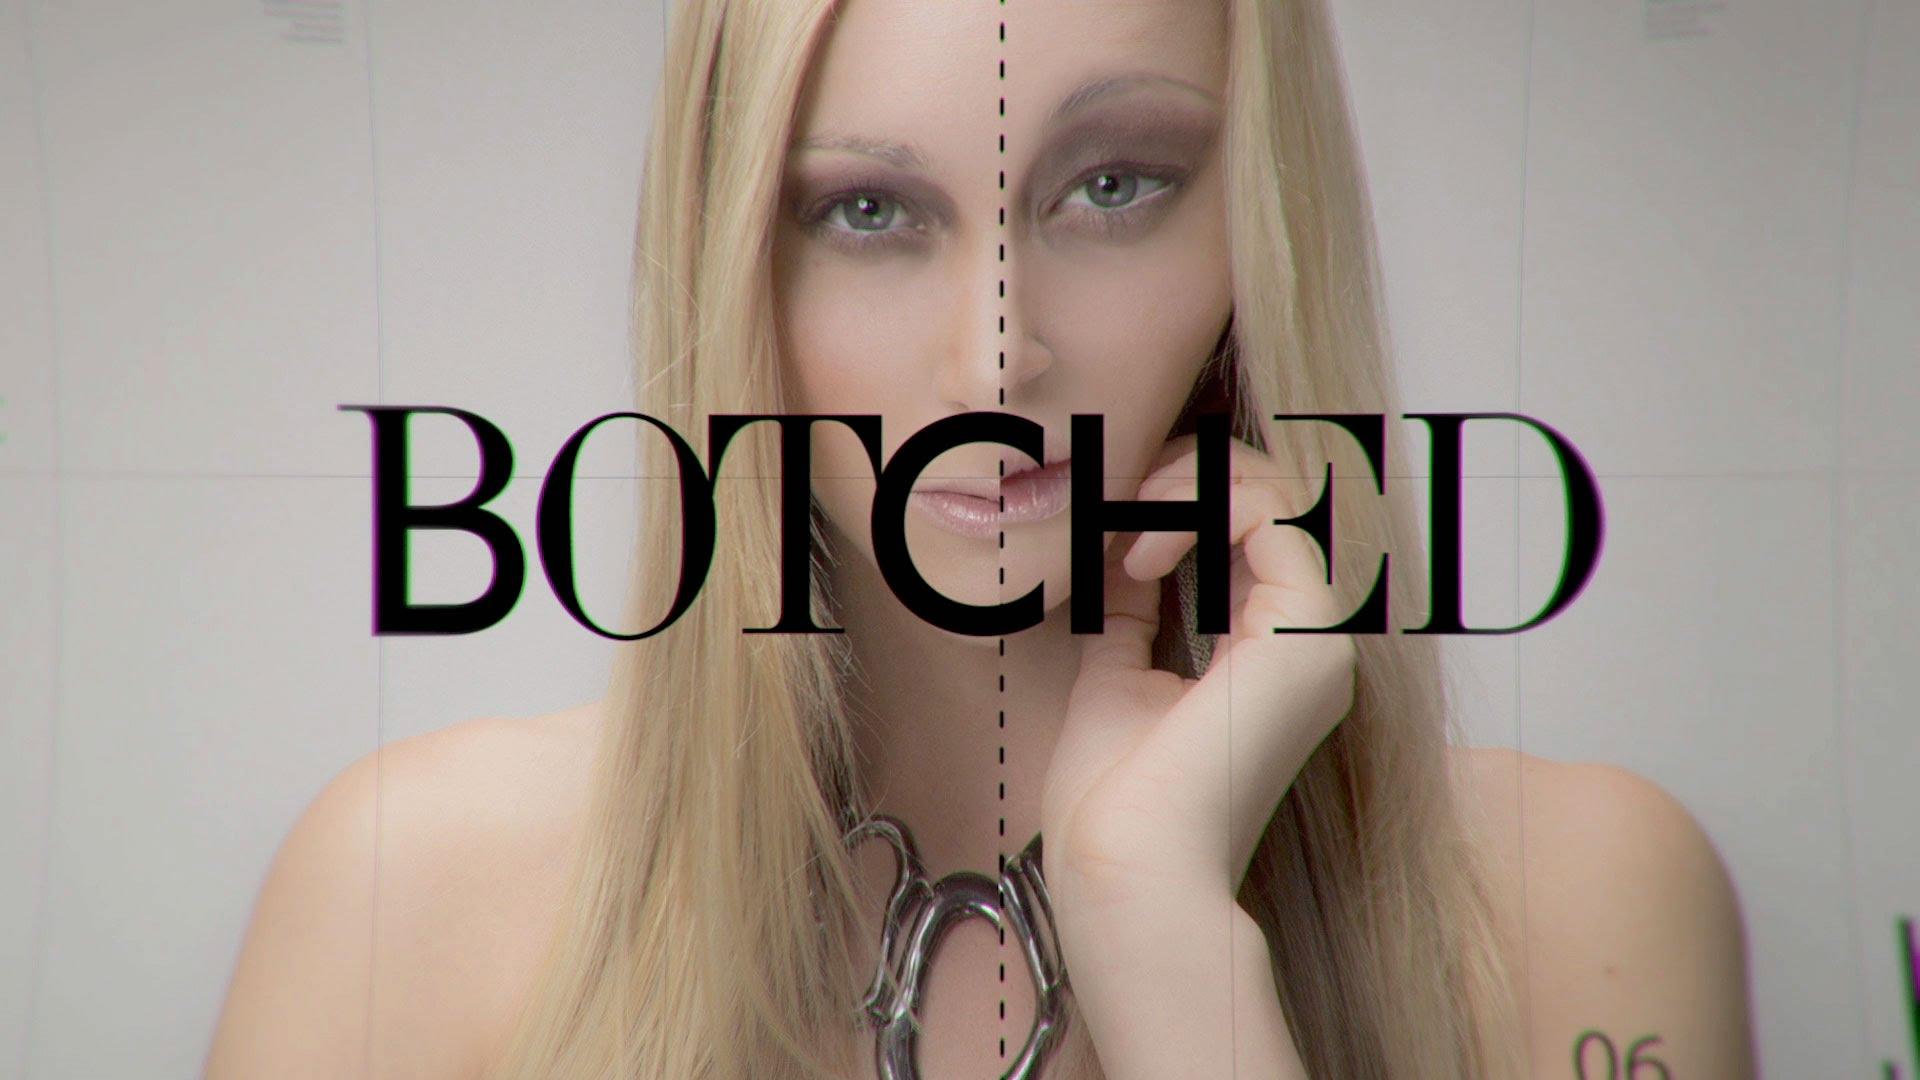 Botched: Season 1